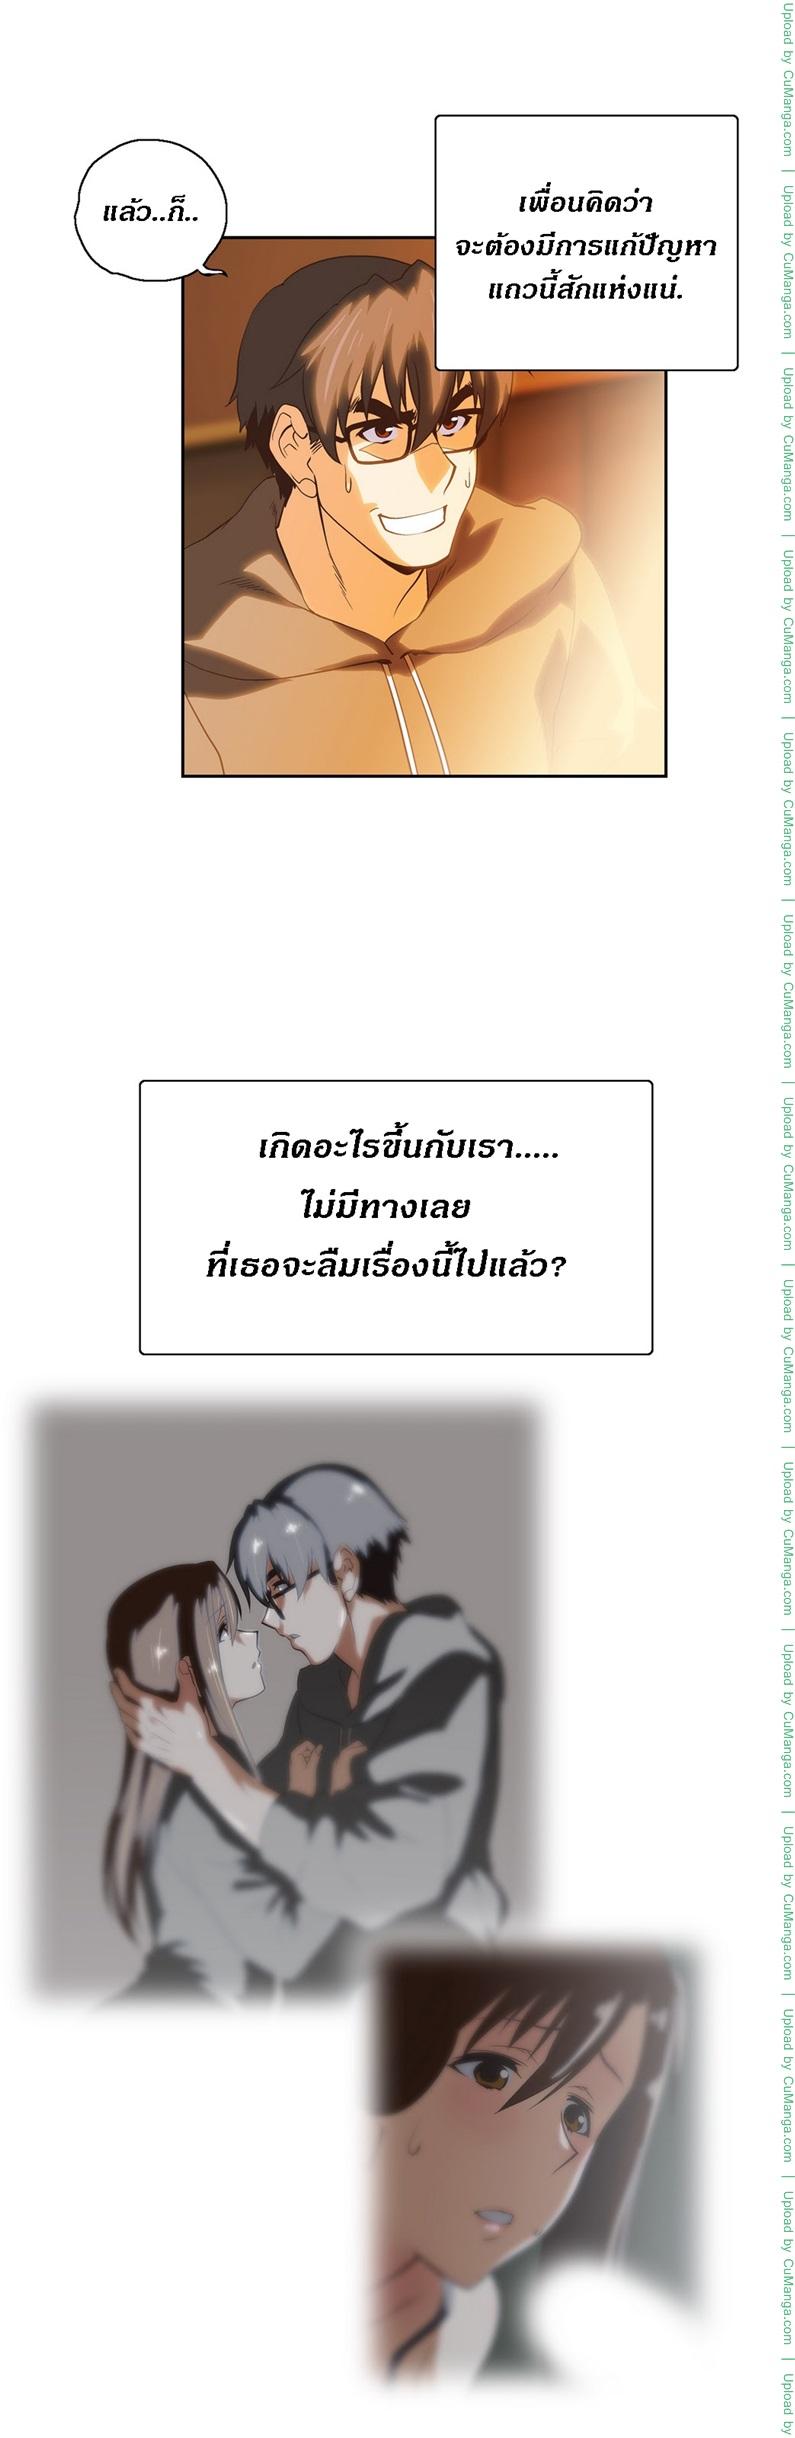 SStudy 45 - หน้า 4